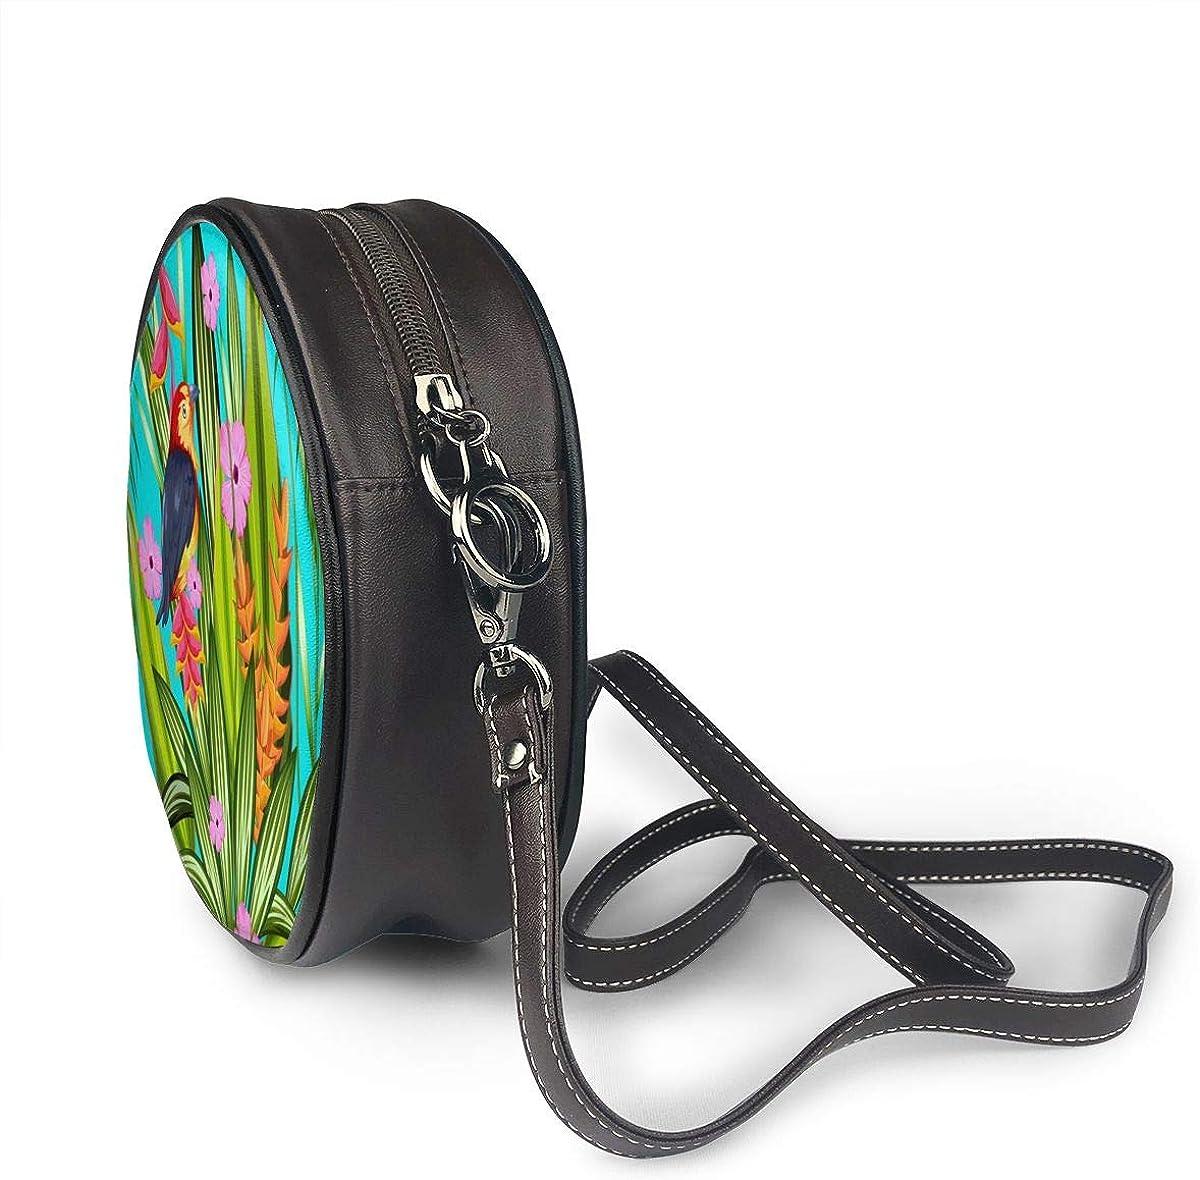 Tropical Palm Bird Flower Round Leather Shoulder Bag Fashion Lady Crossbody Wallet Adjustable Top Handbag For Women Girl